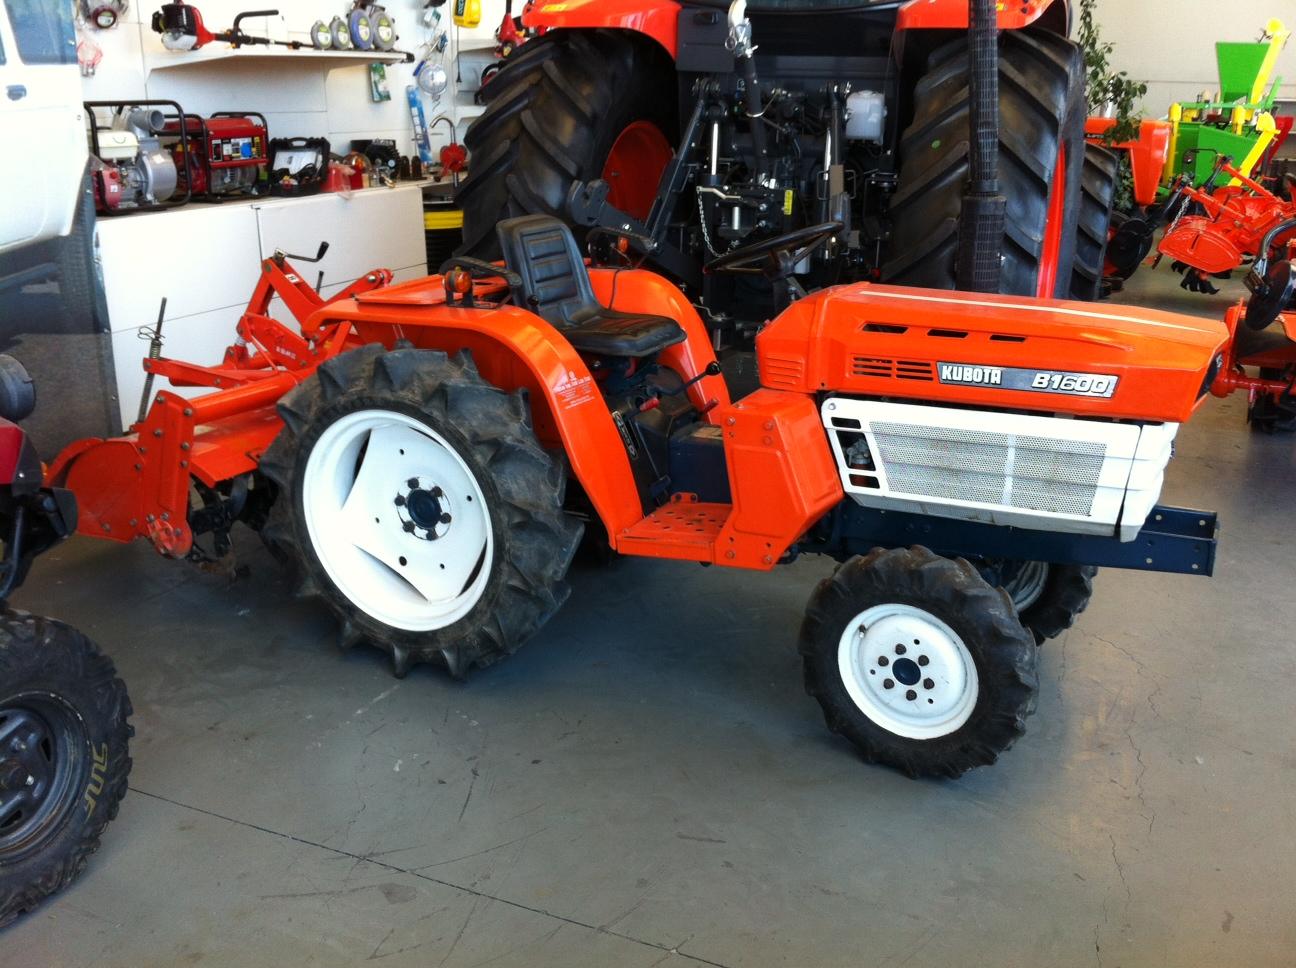 Mini tractor de ocasi n kubota b 1600 dt talleres hijos - Mesillas de segunda mano ...